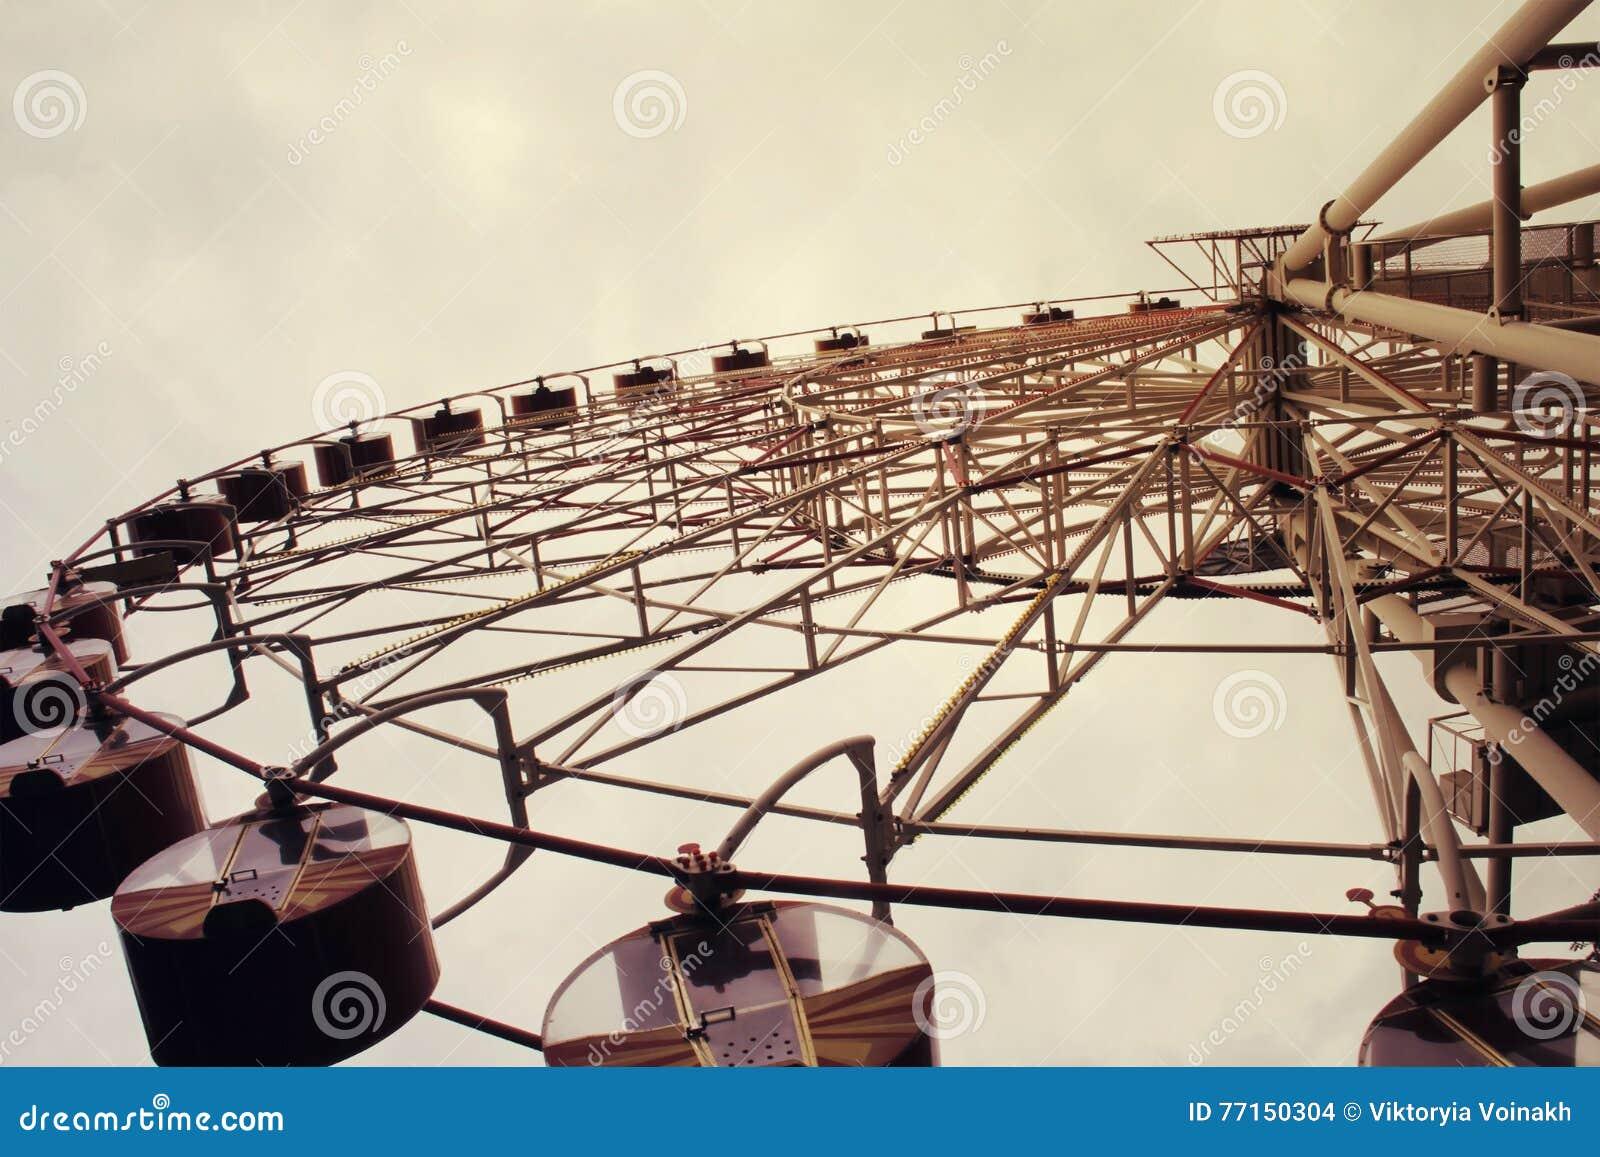 Ferris wheel toned in vintage style